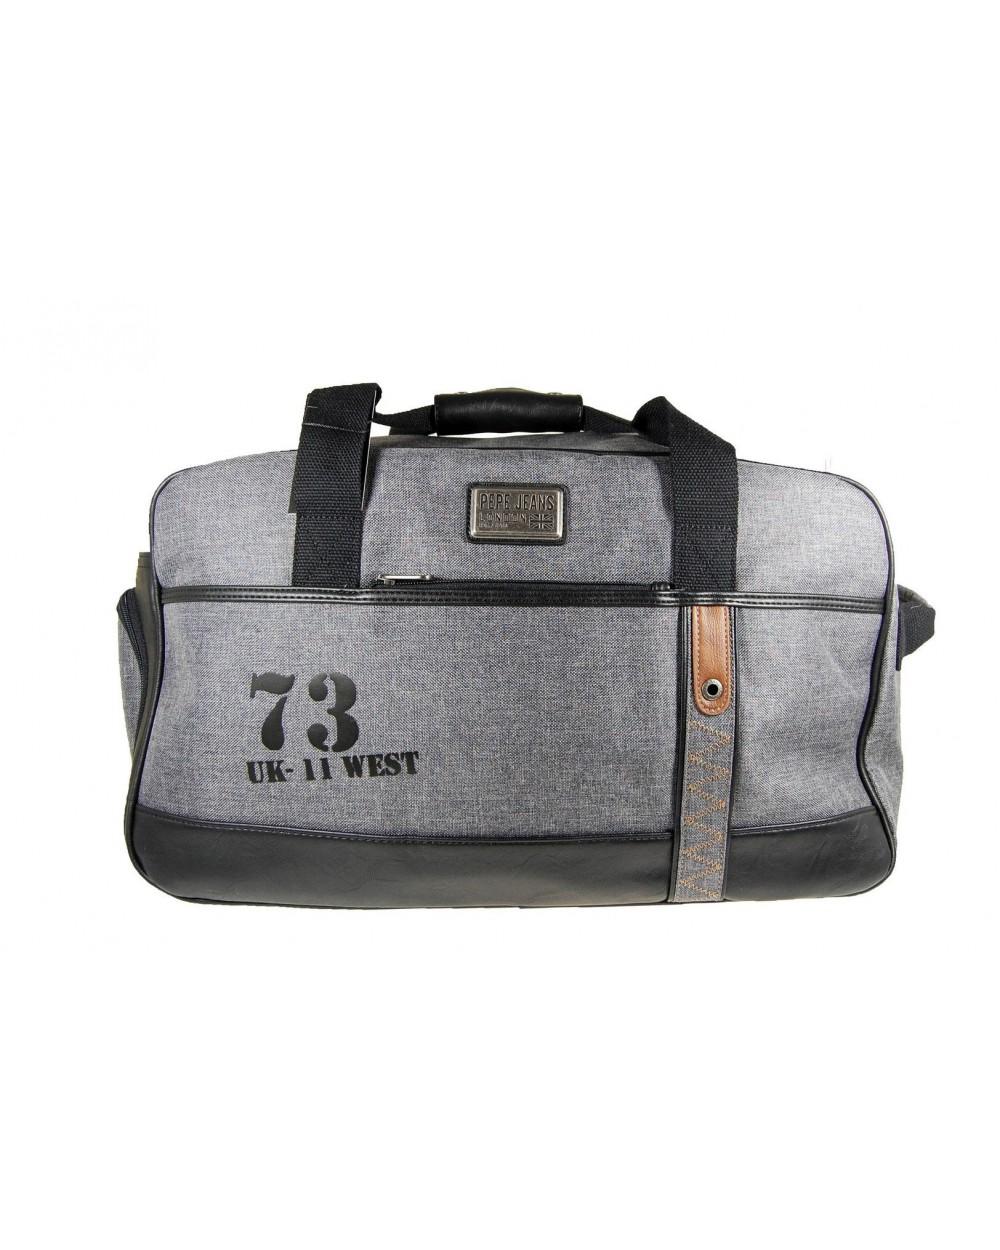 PEPE JEANS - torba podróżna